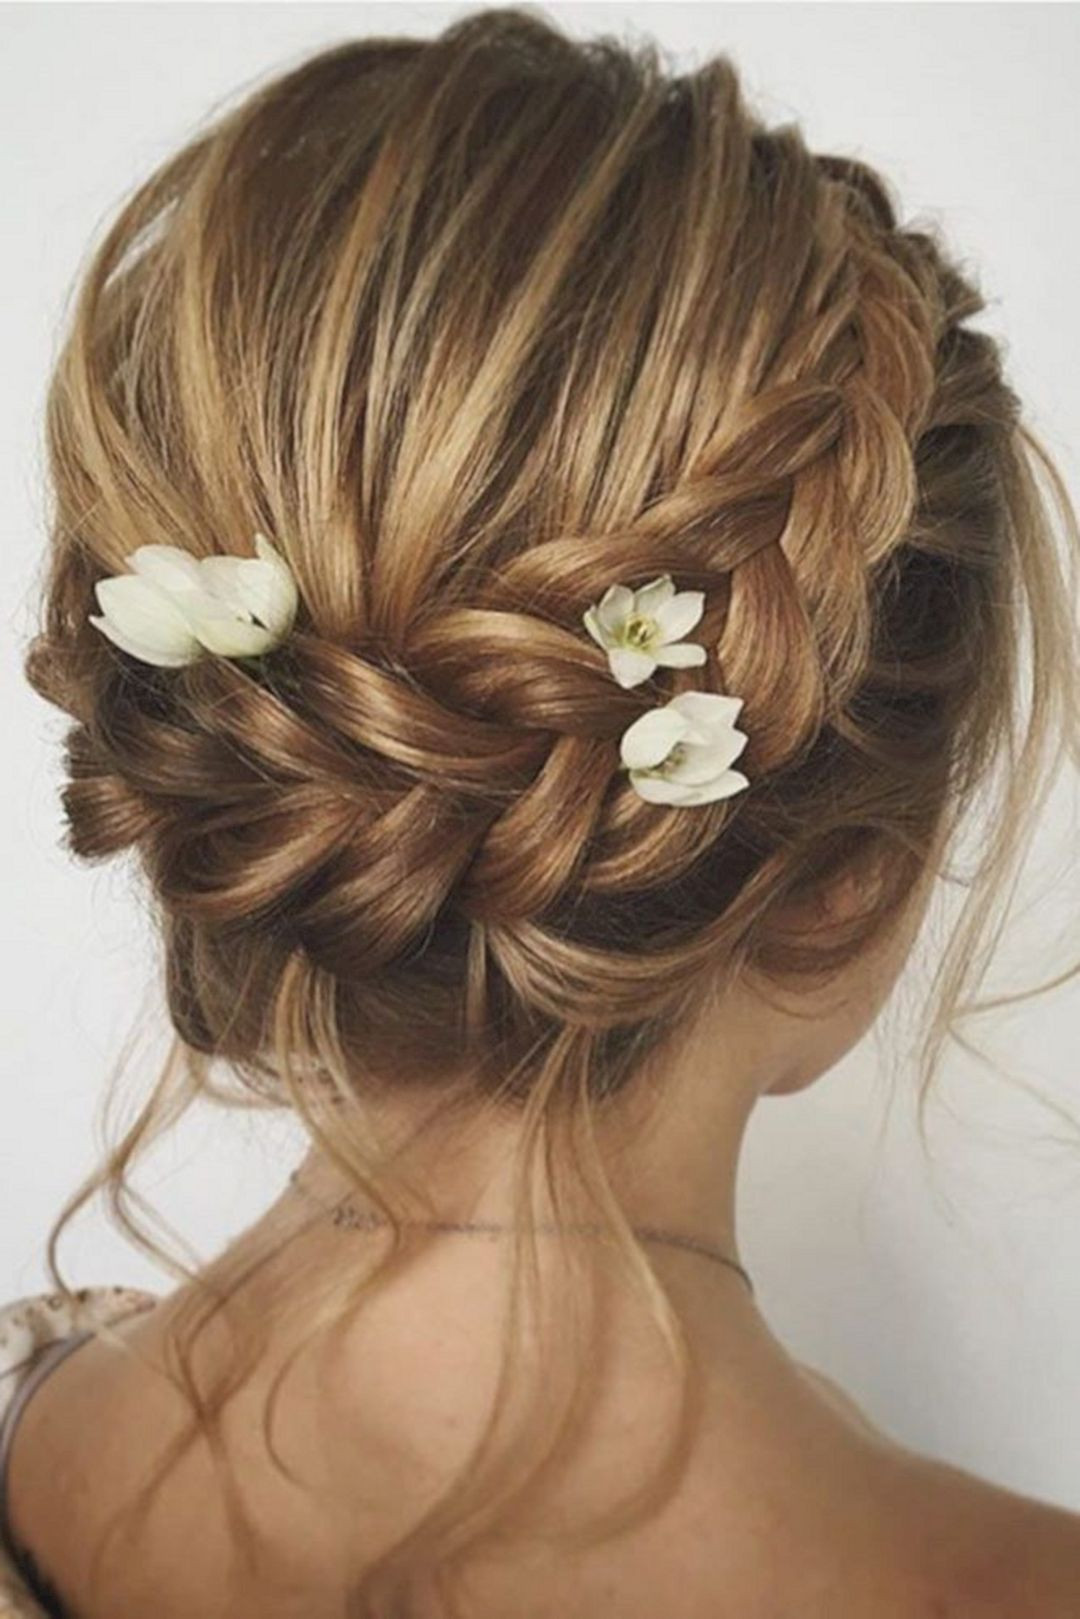 Short Bridesmaid Hairstyles  Wedding Bridesmaid Hairstyles for Short Hairs – OOSILE